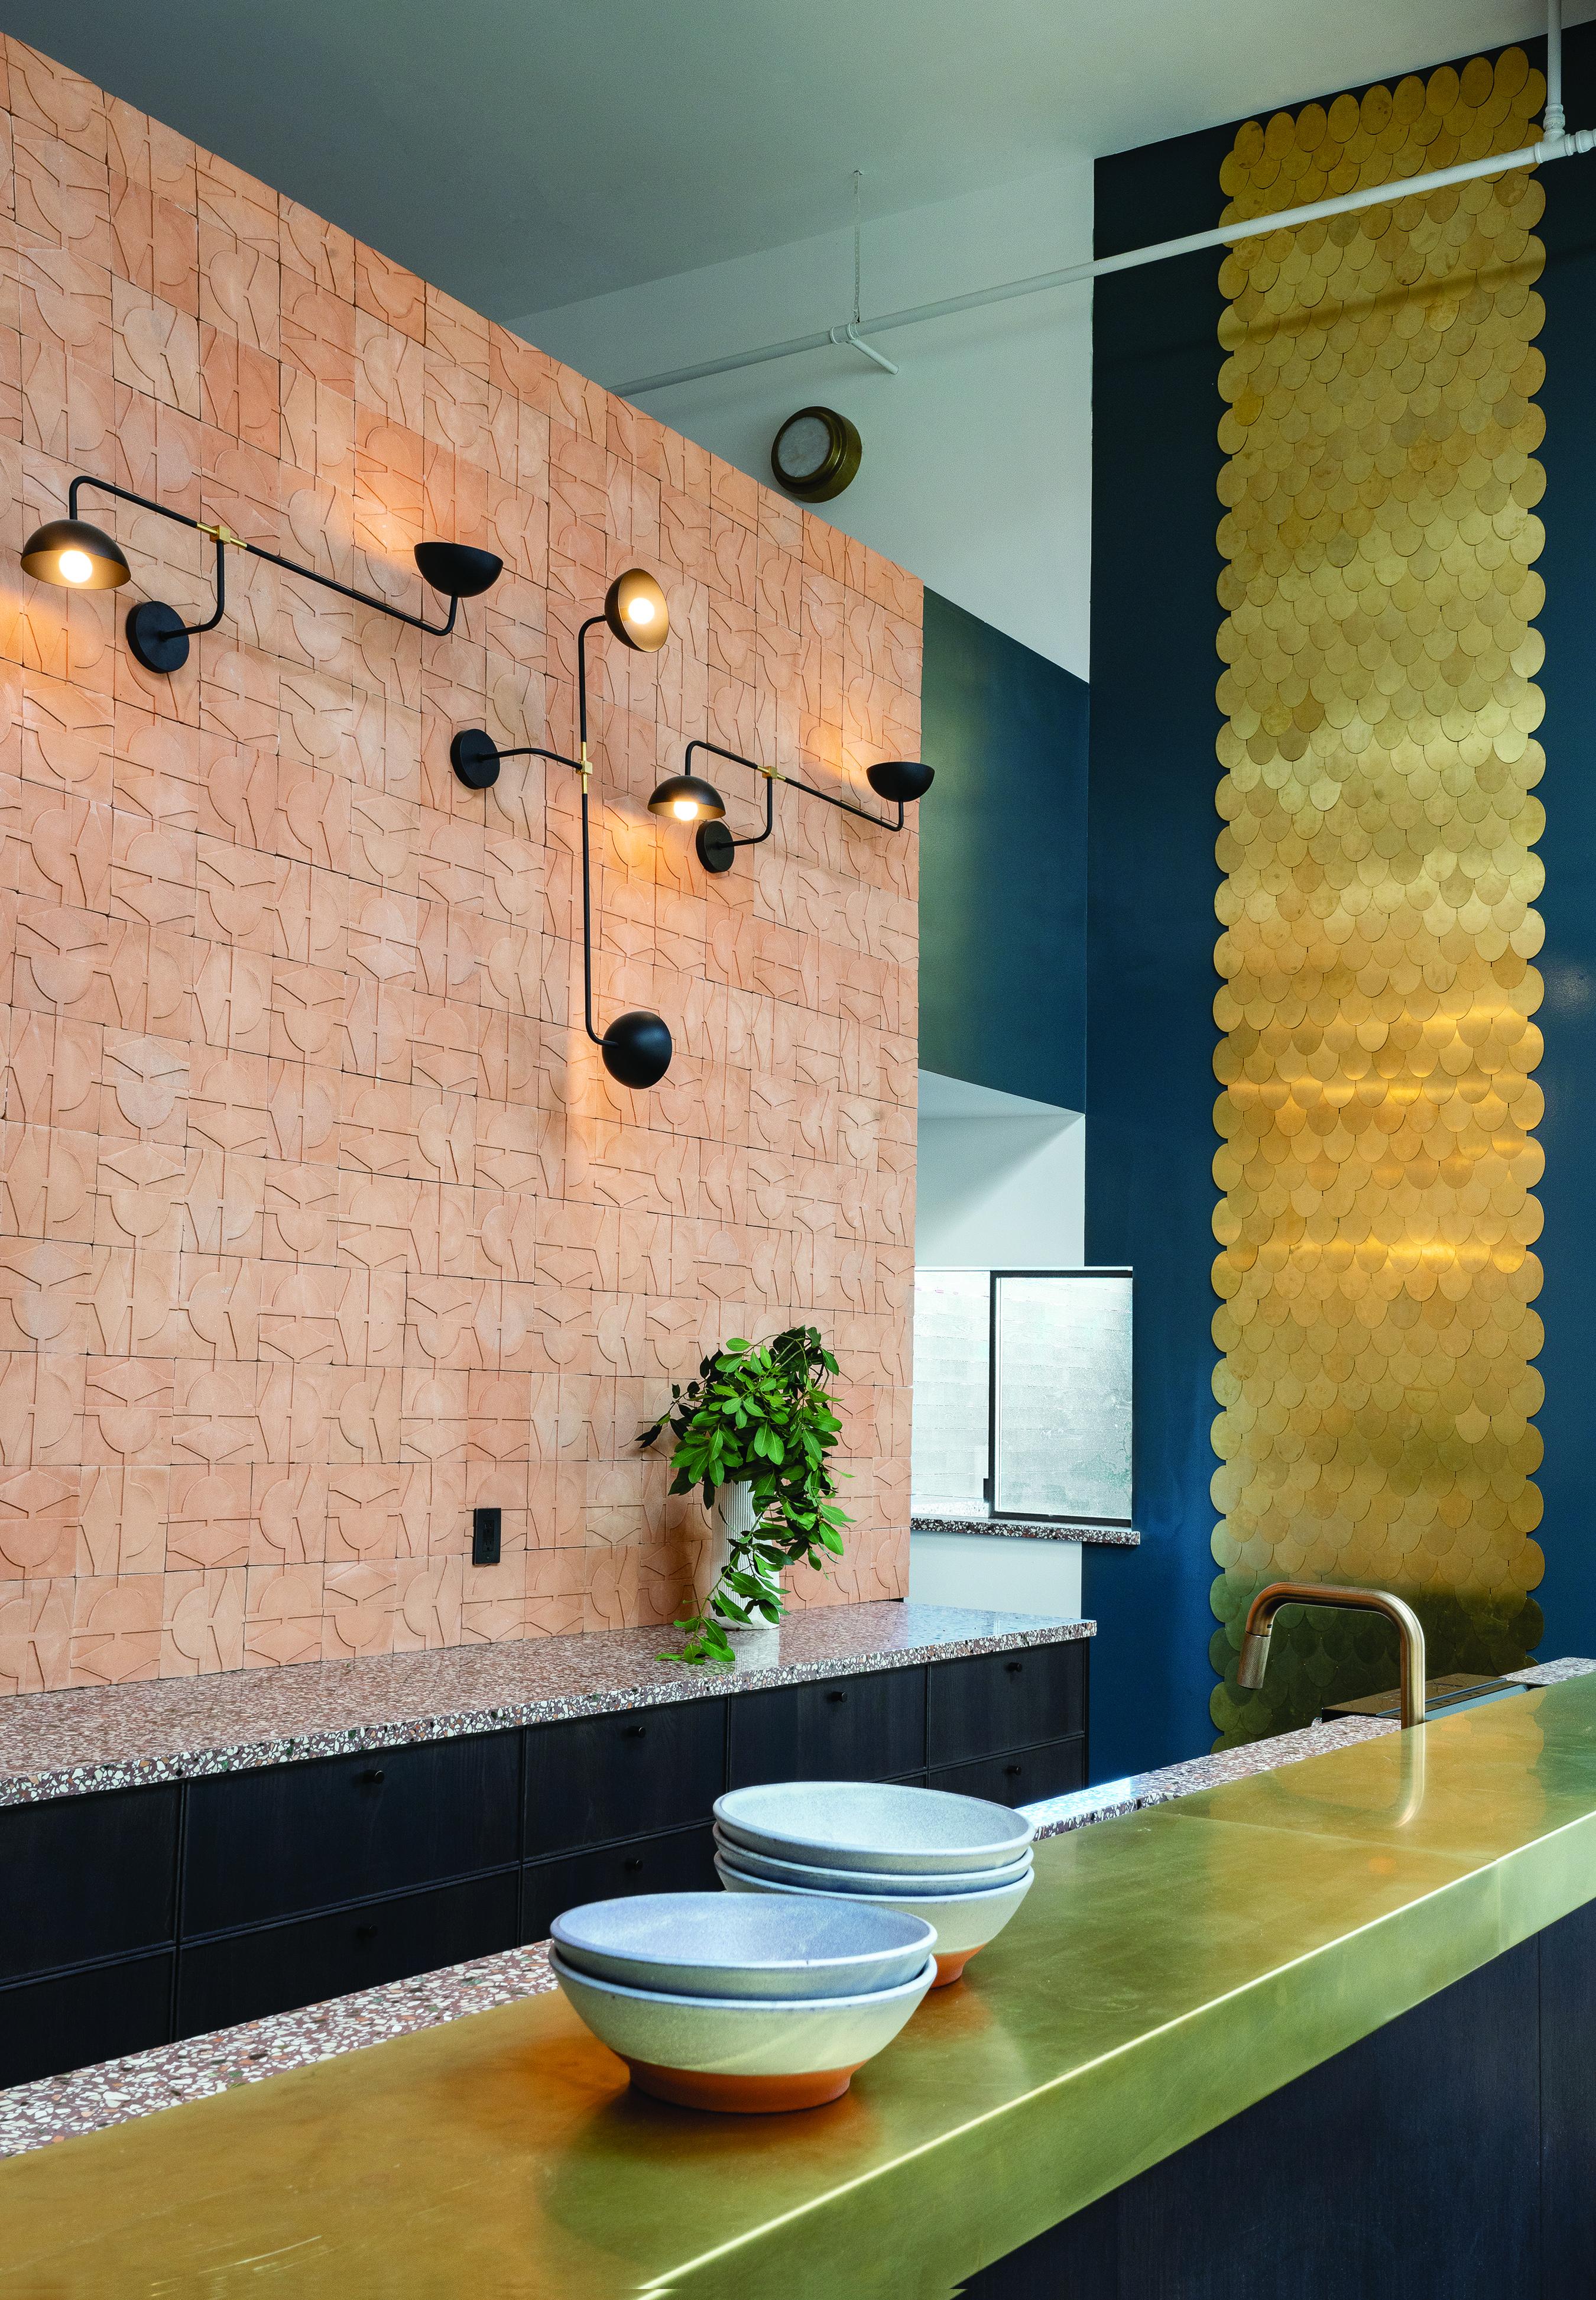 2019 Interior Design Boy Awards Cle Is A Winner Design Round Mirror Bathroom Dimensional Wall